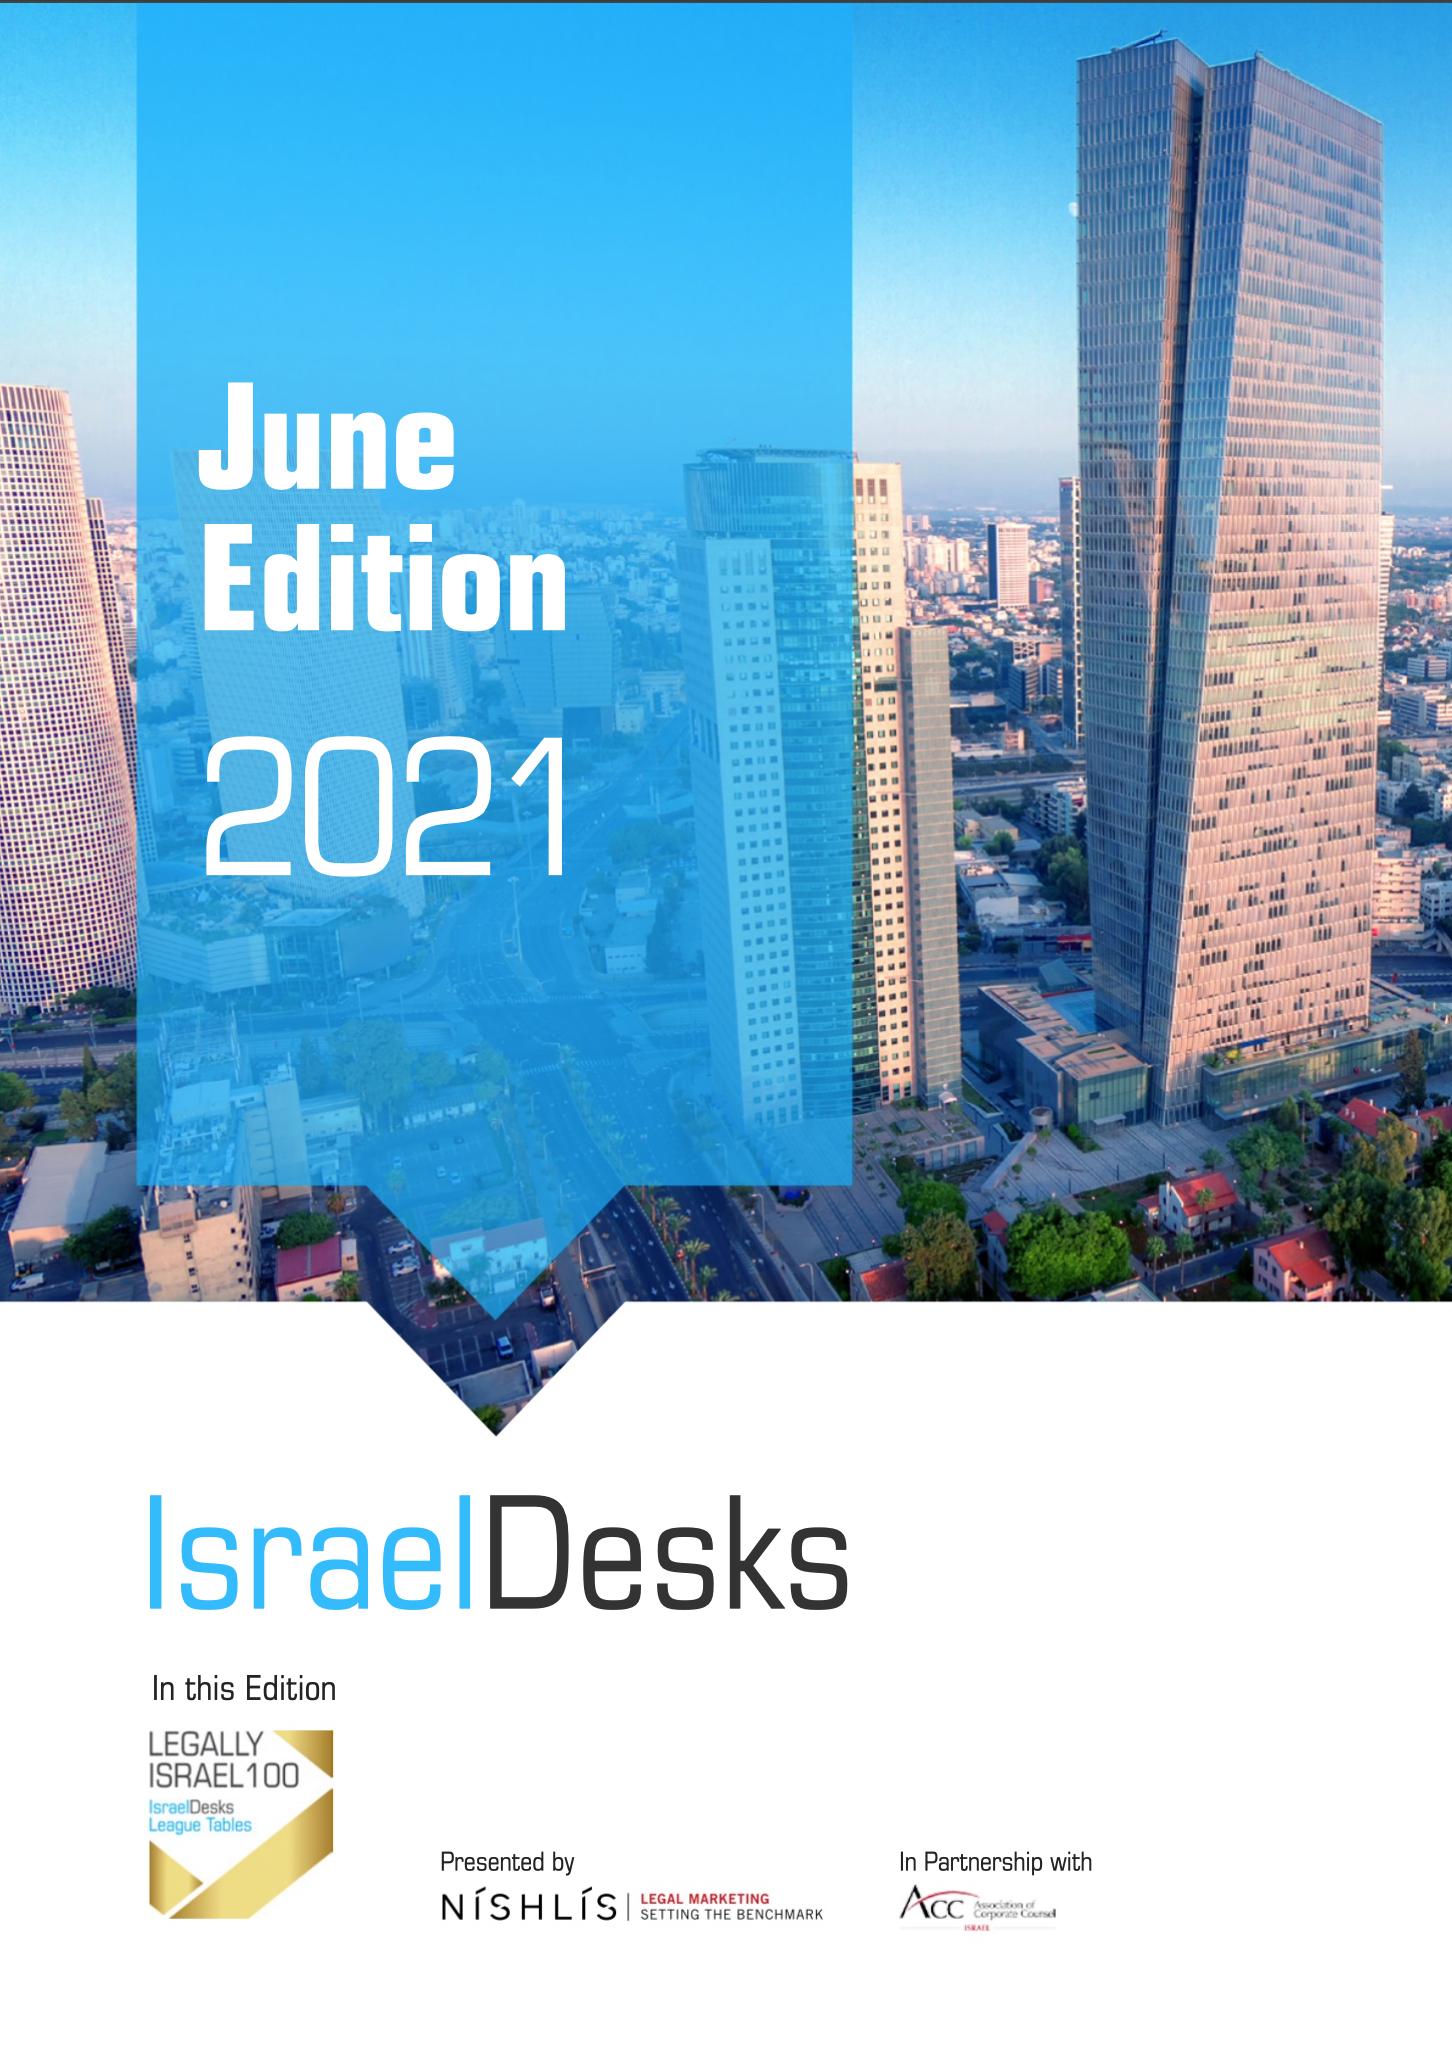 IsraelDesks Magazine – Legally Israel 100 Special Edition